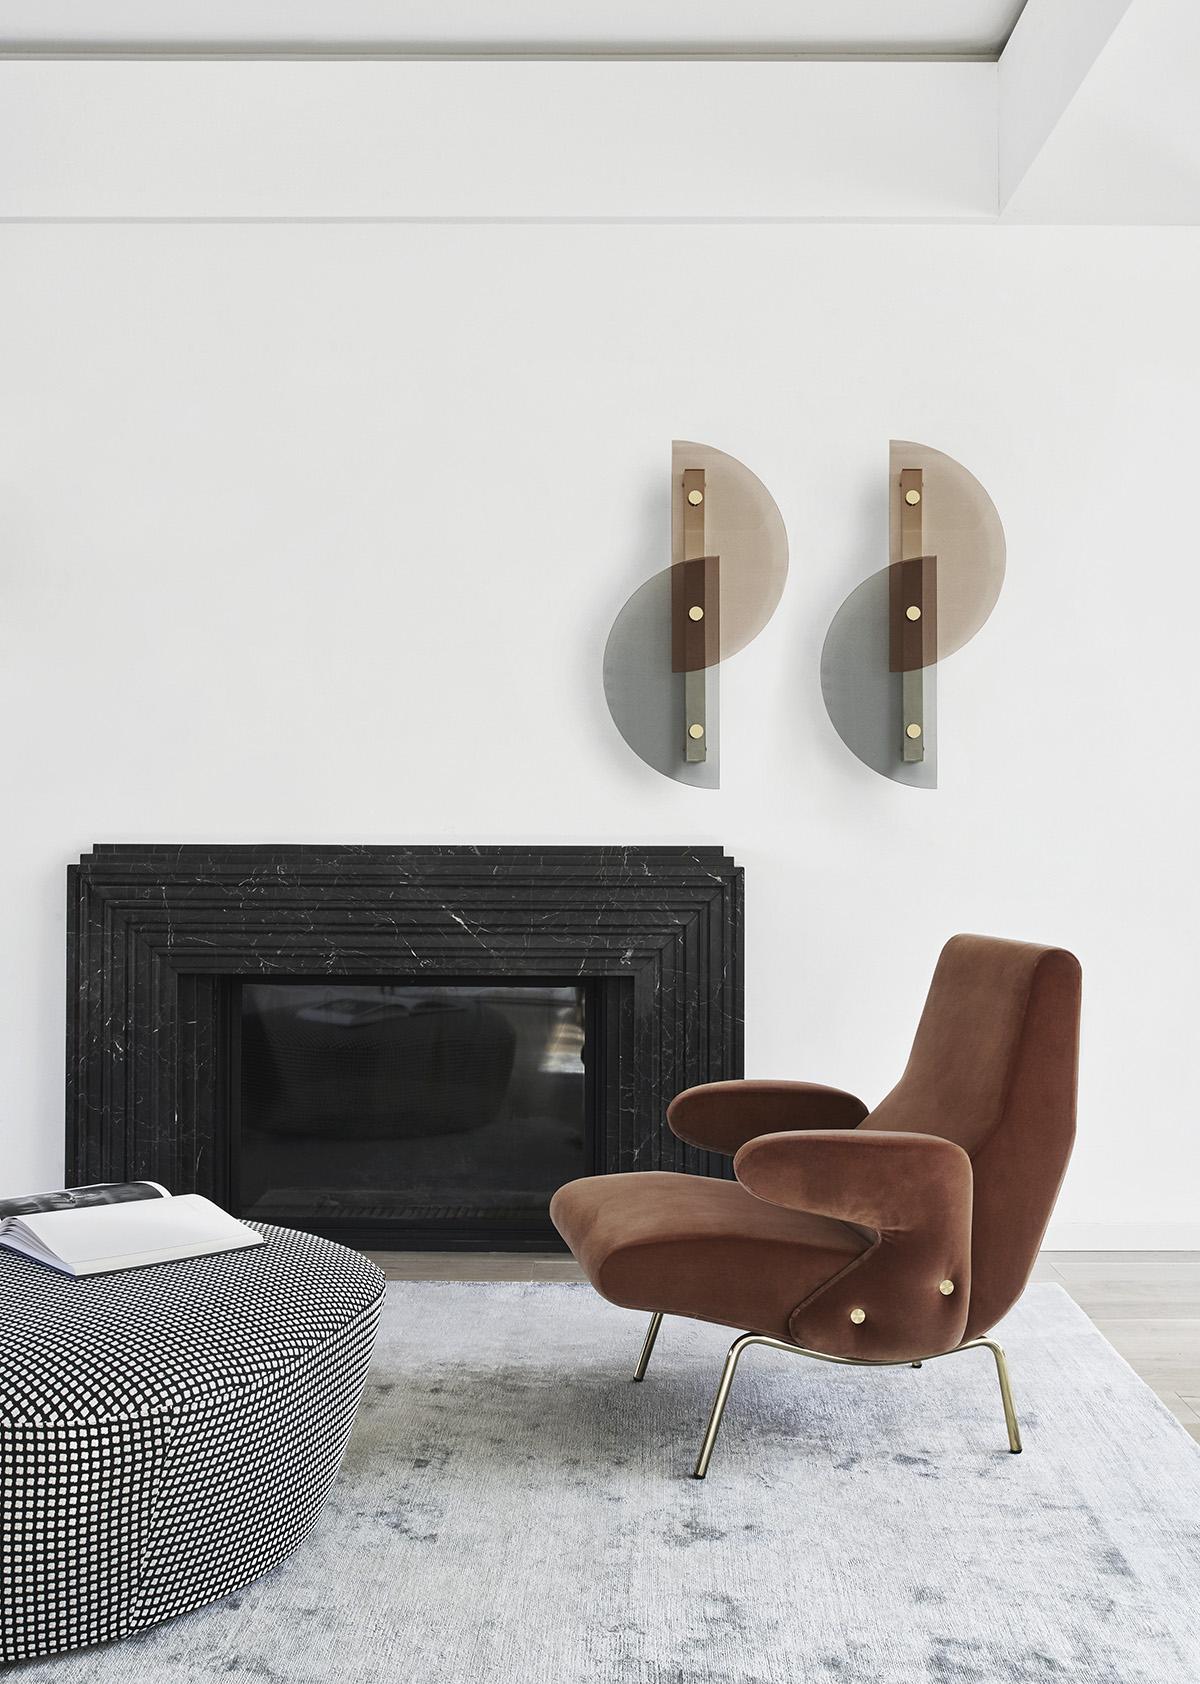 TinnappleMetz-arflex-Arflex-Papillon-Wall-Lamp-liste-02